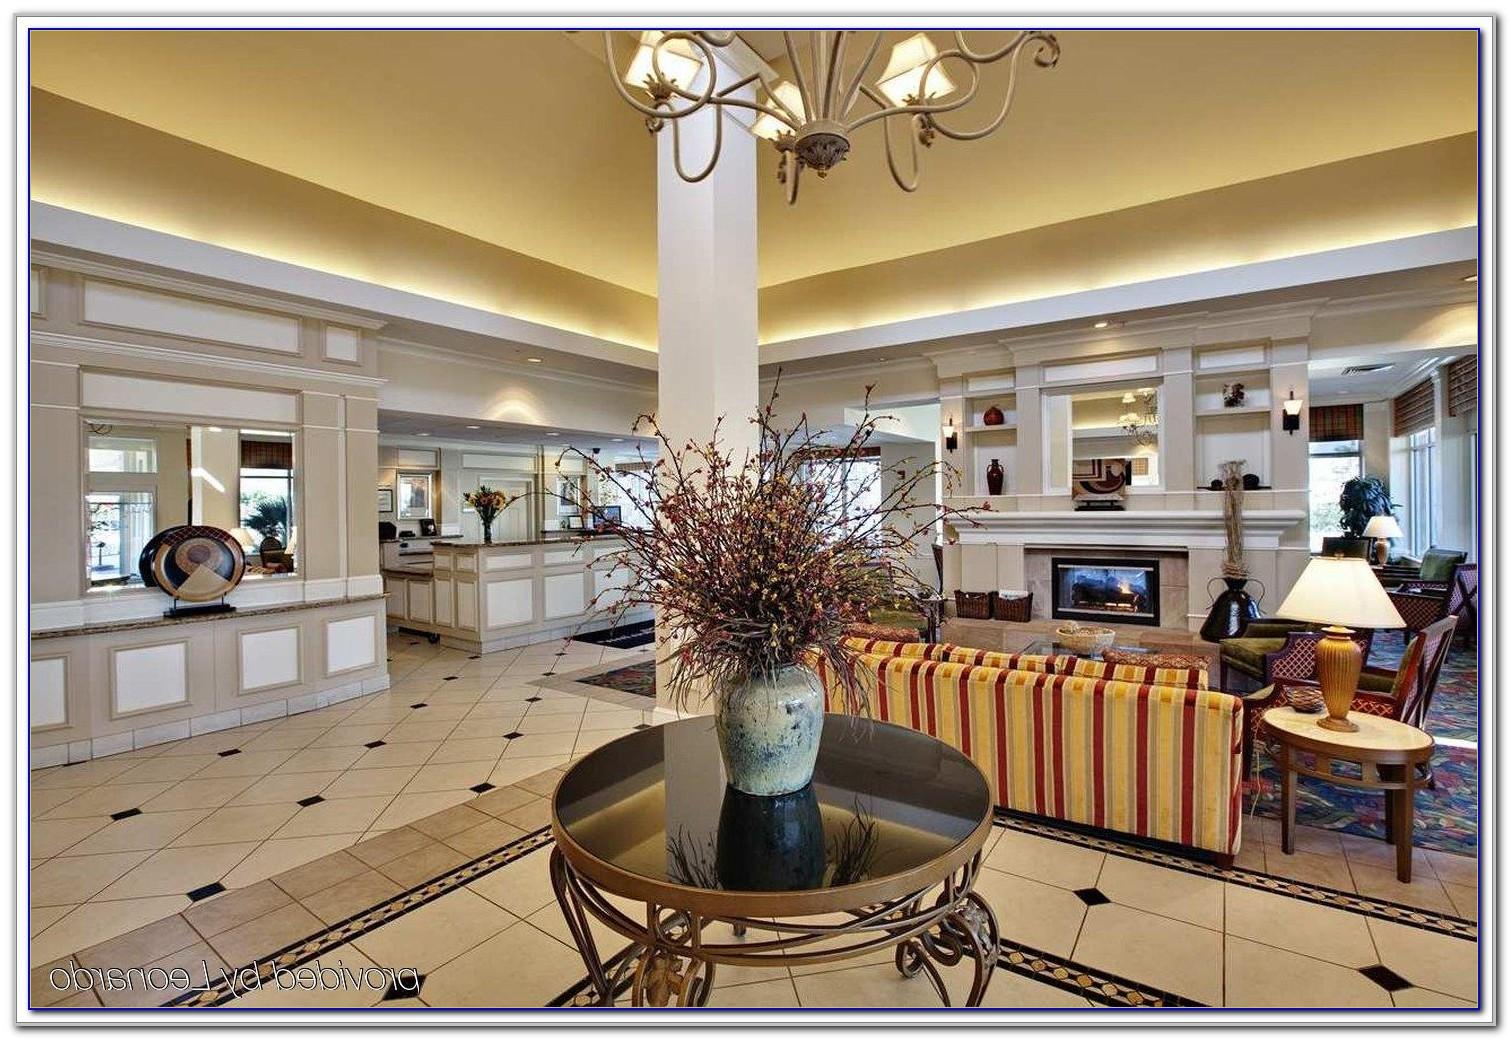 Hilton Garden Inn St George Pool